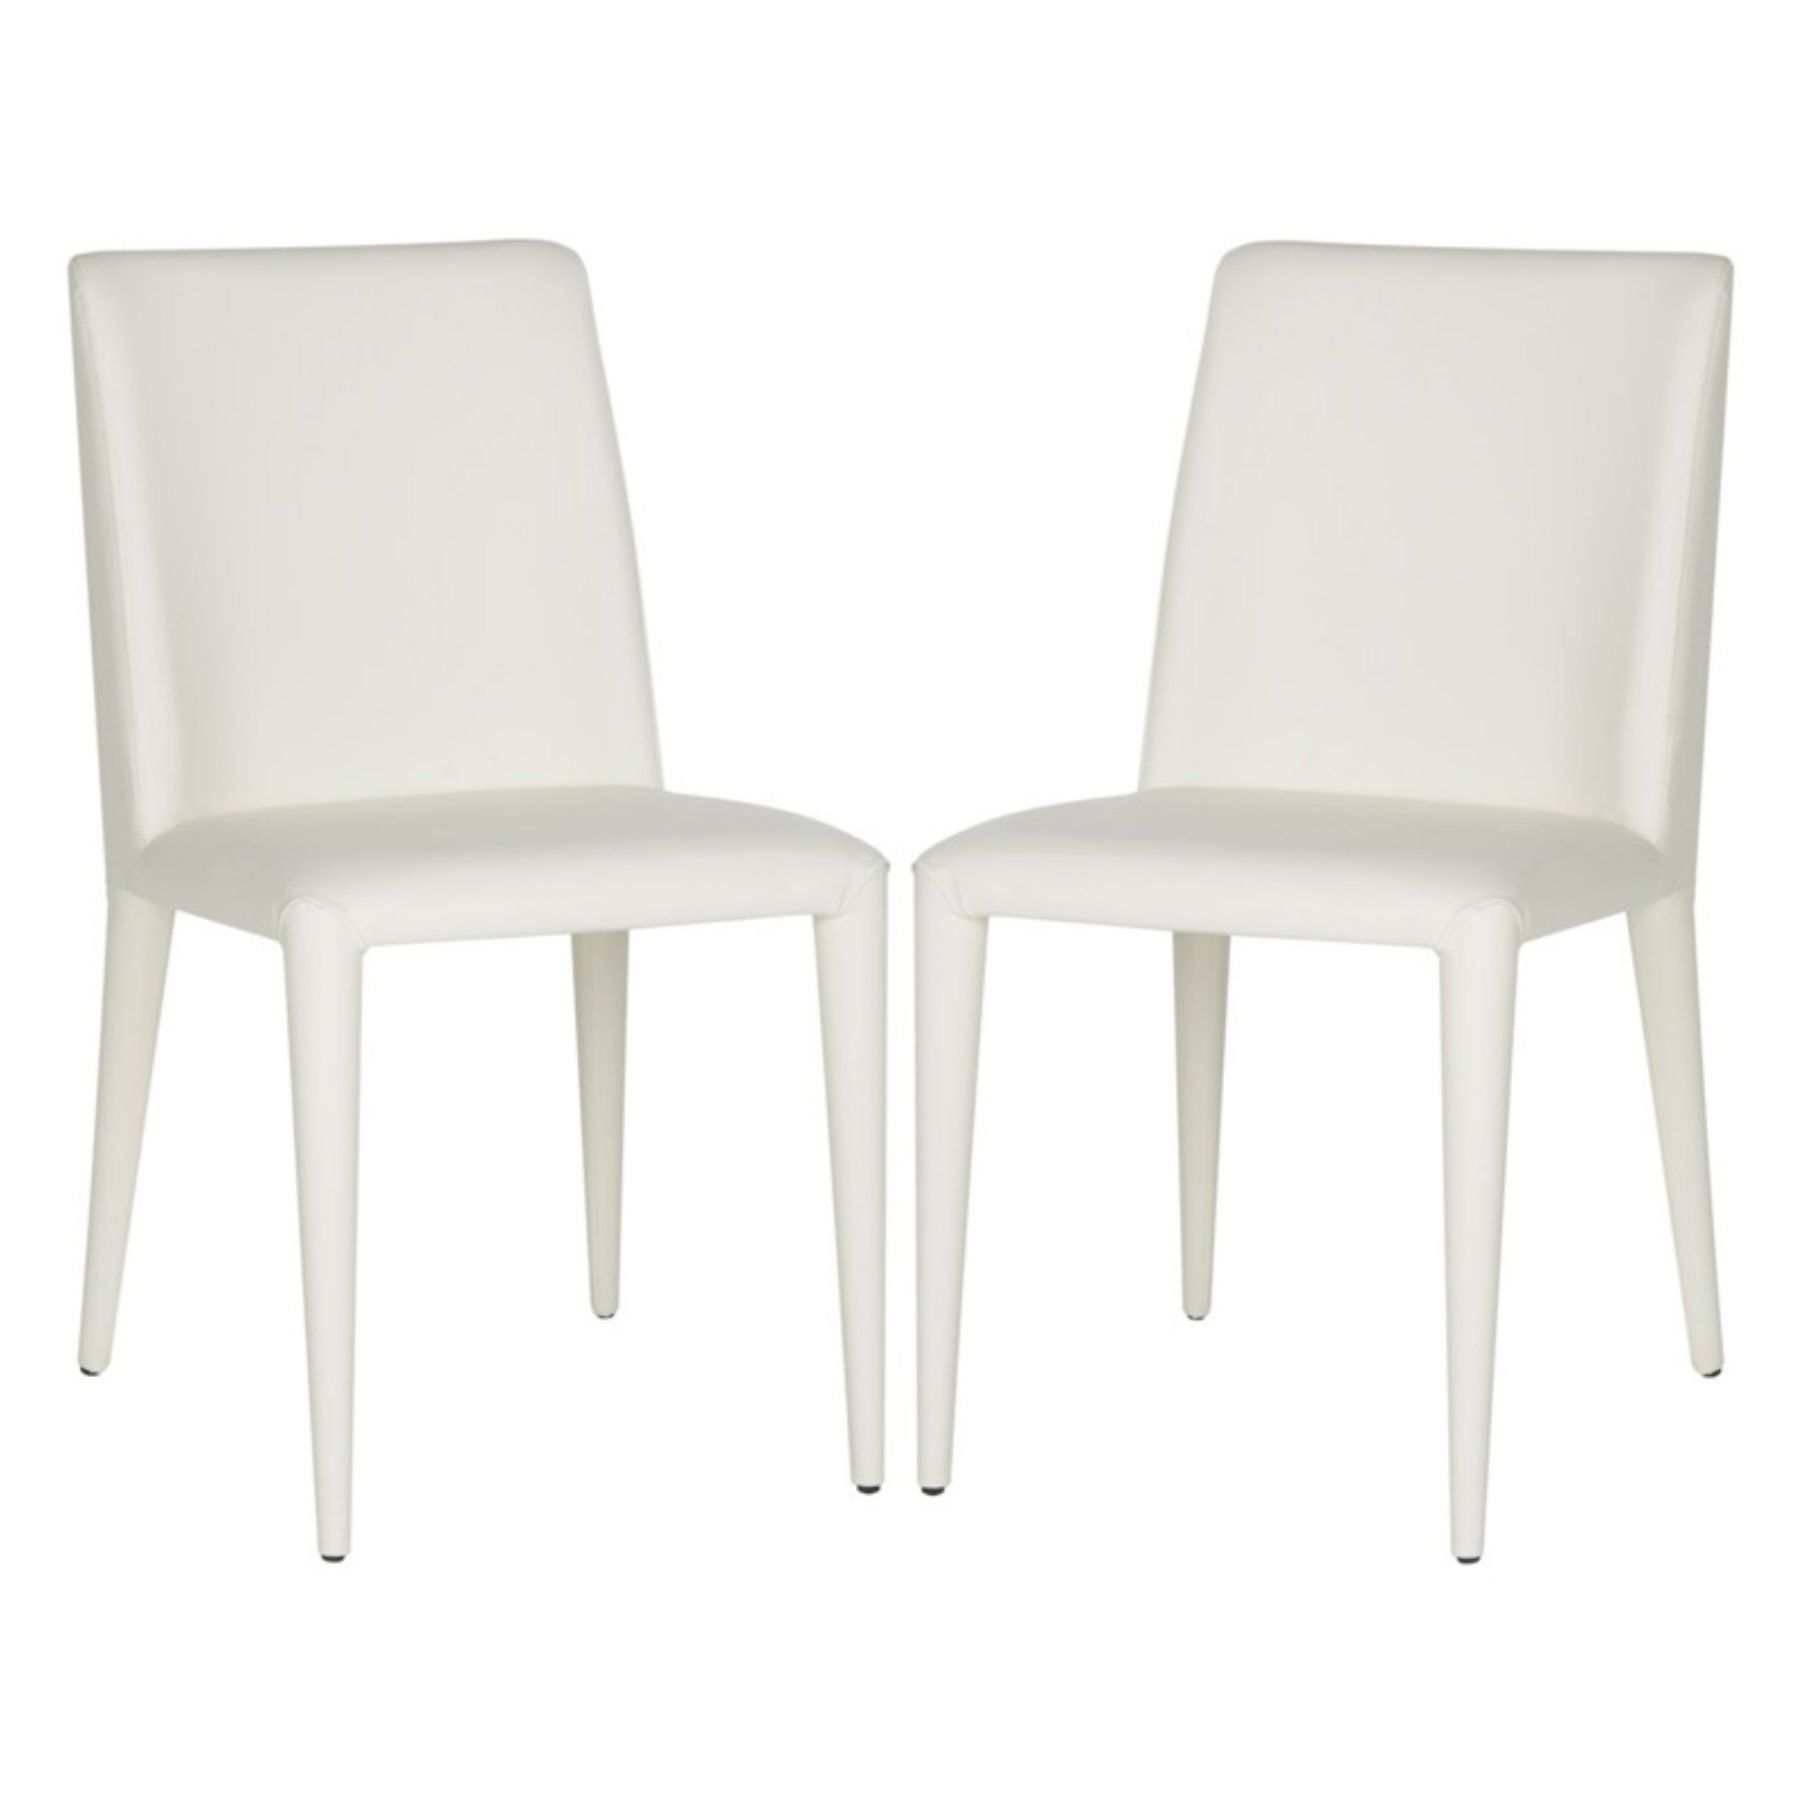 Safavieh Garretson Leather Side Dining Chair - Set of 2 Buttercream - FOX2019C-SET2